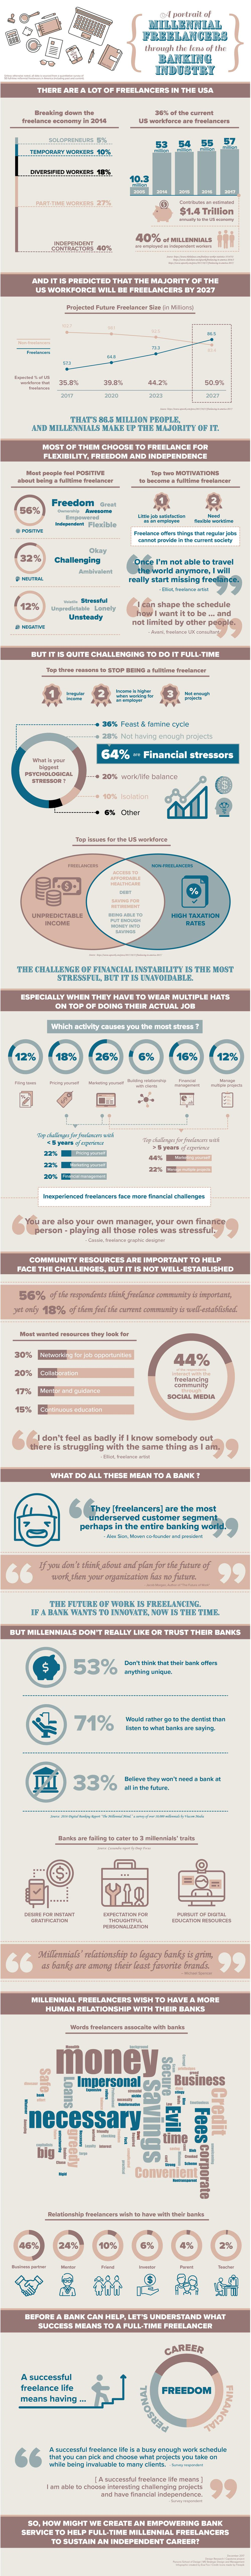 Design reserach infographic_FOO.jpg